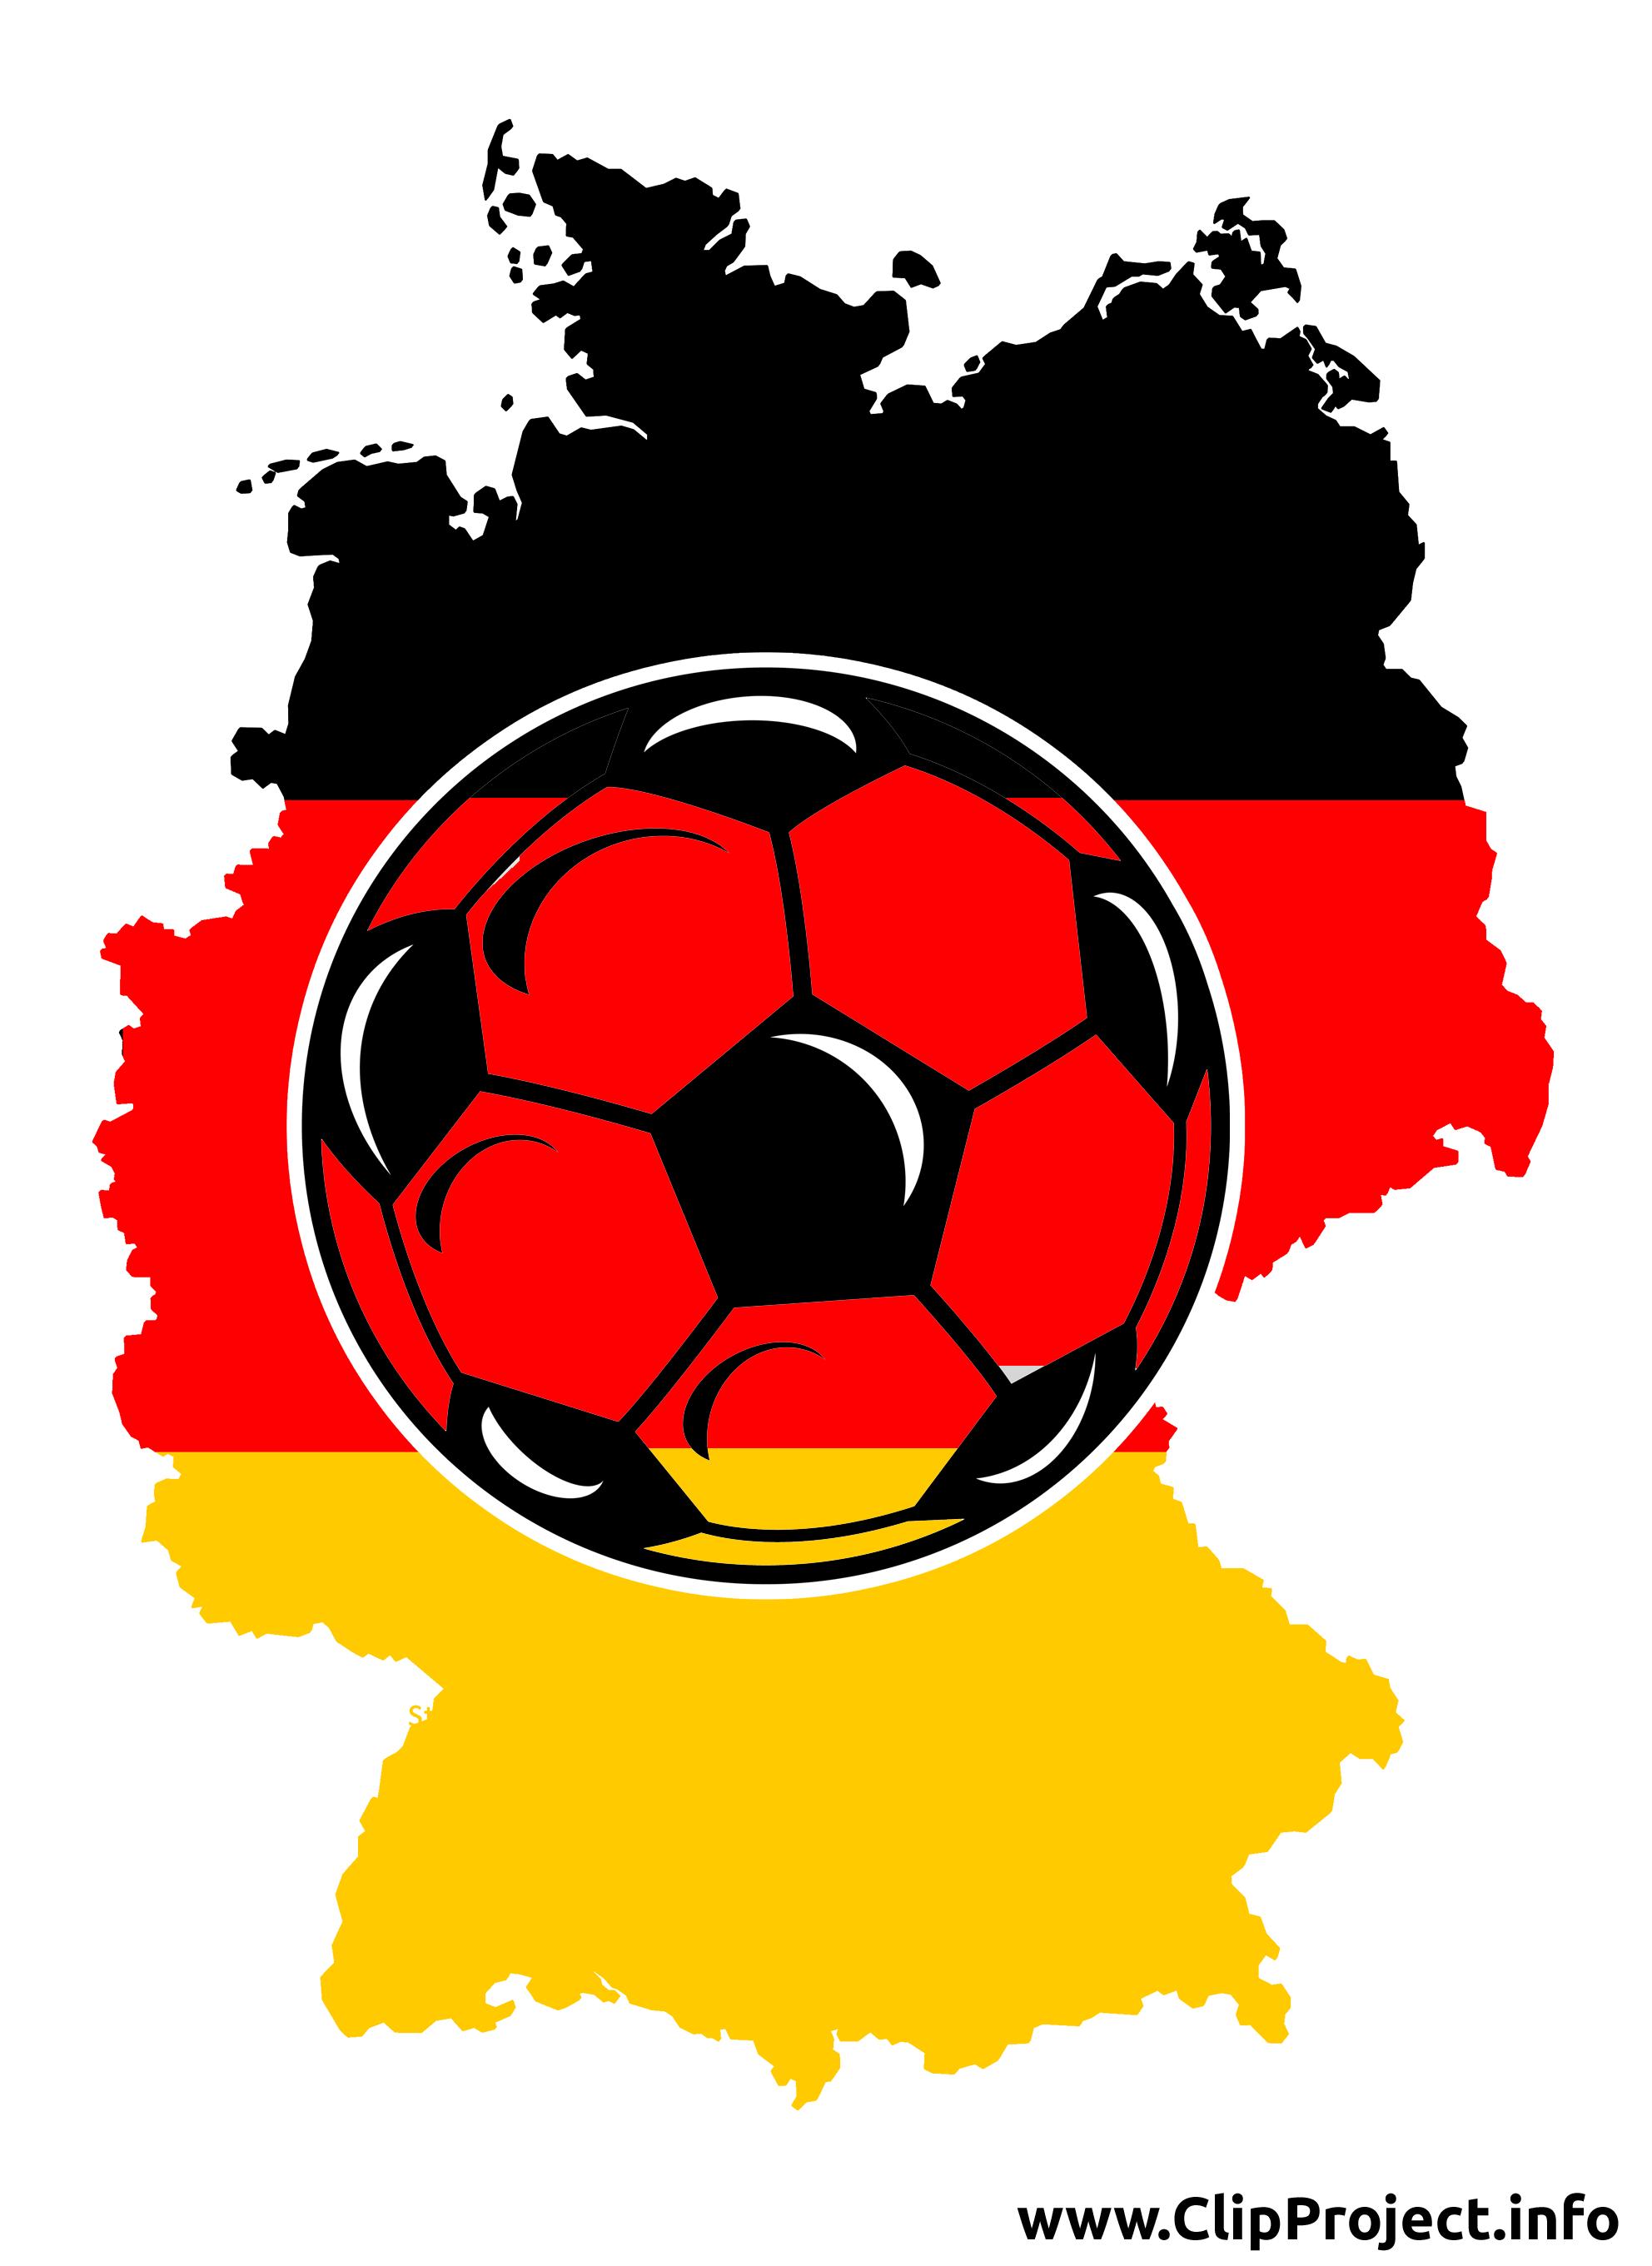 Football clipart - Allemagne images gratuites